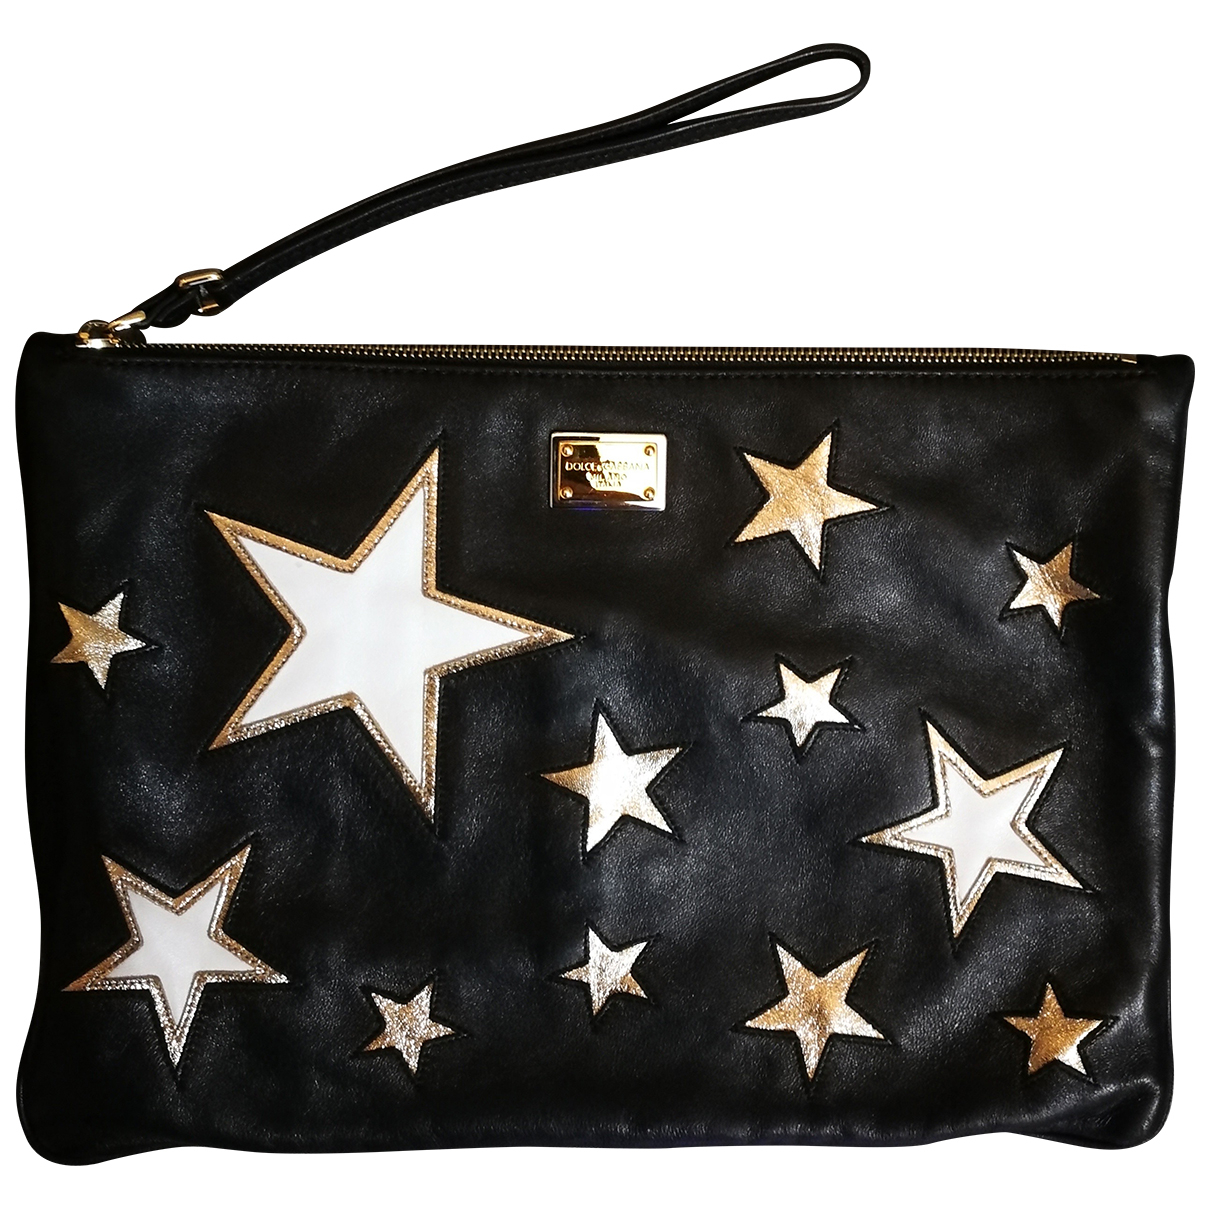 Dolce & Gabbana N Black Leather Clutch bag for Women N